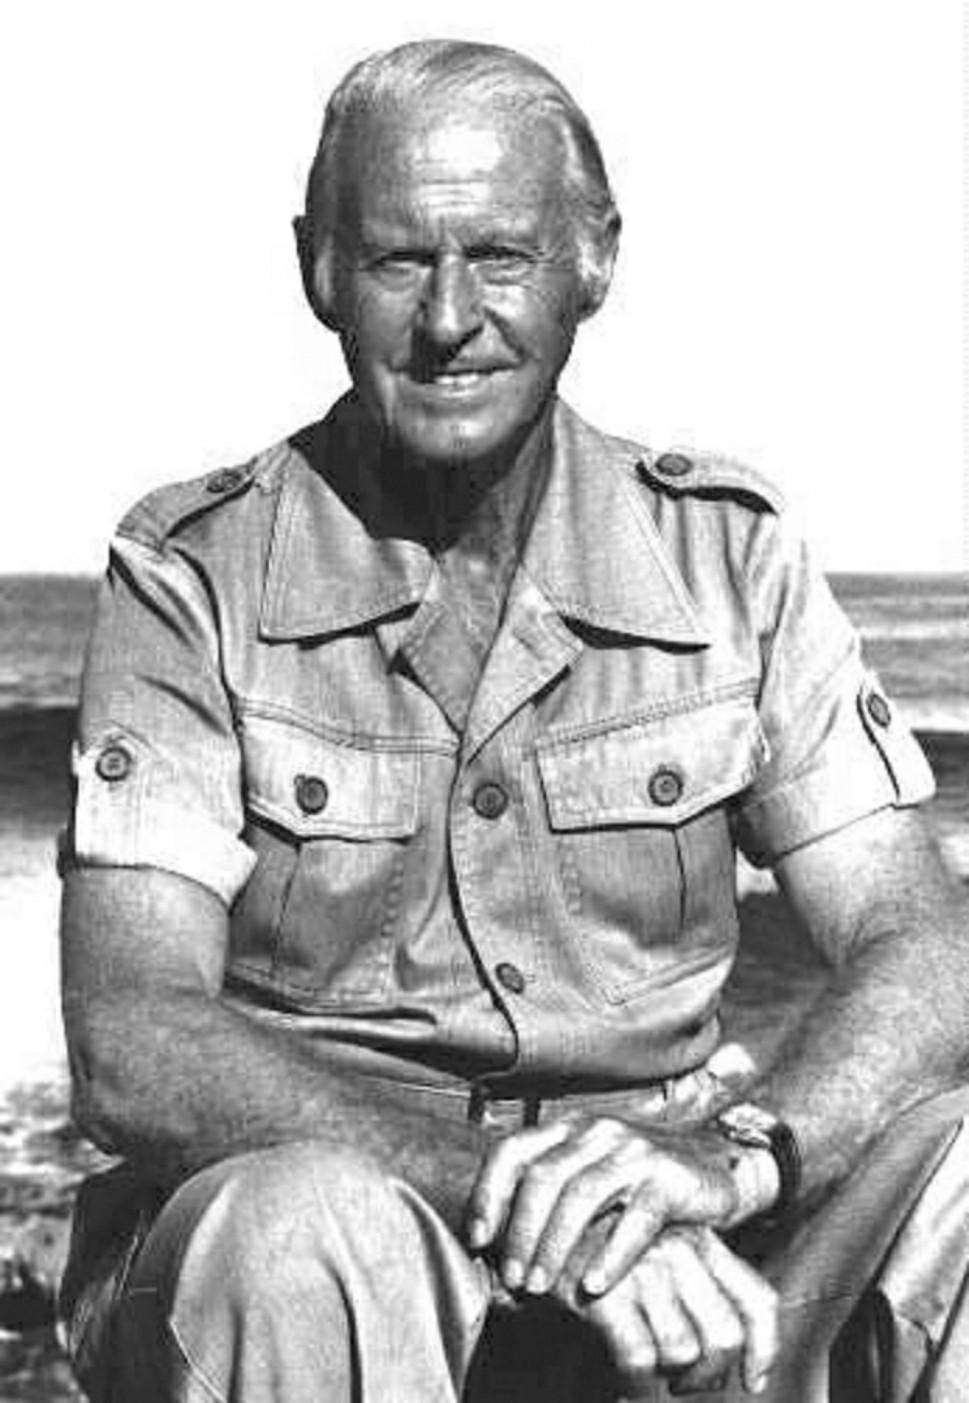 Portrait of Thor Heyerdahl, as a grown-up explorer.